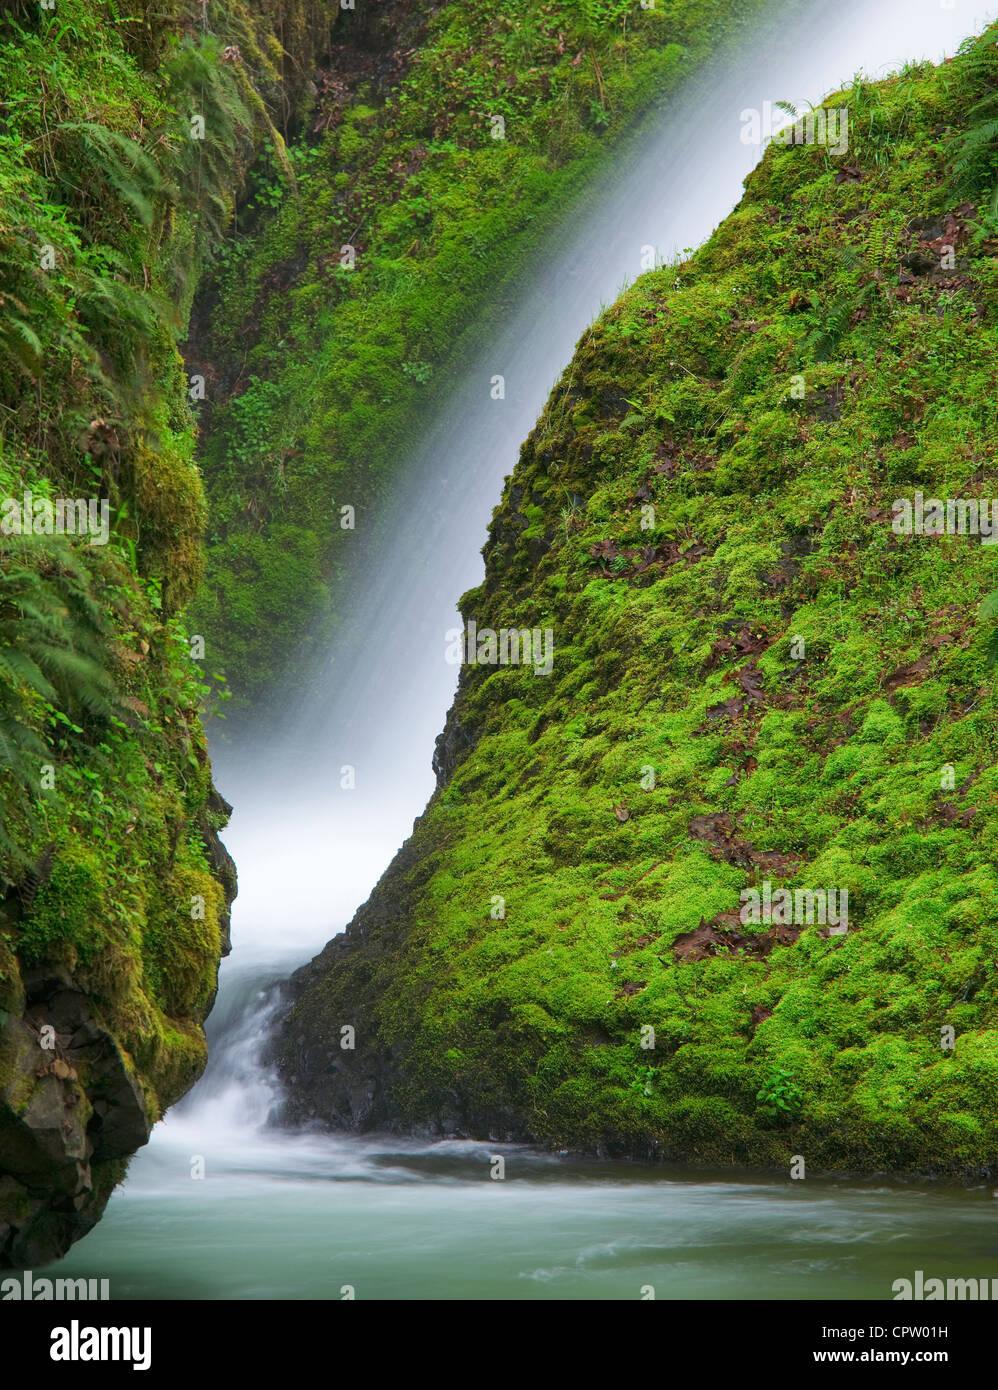 Monte Hood National Forest, O: Detalle de Bridal Veil Falls y rocas cubiertas de musgo Imagen De Stock